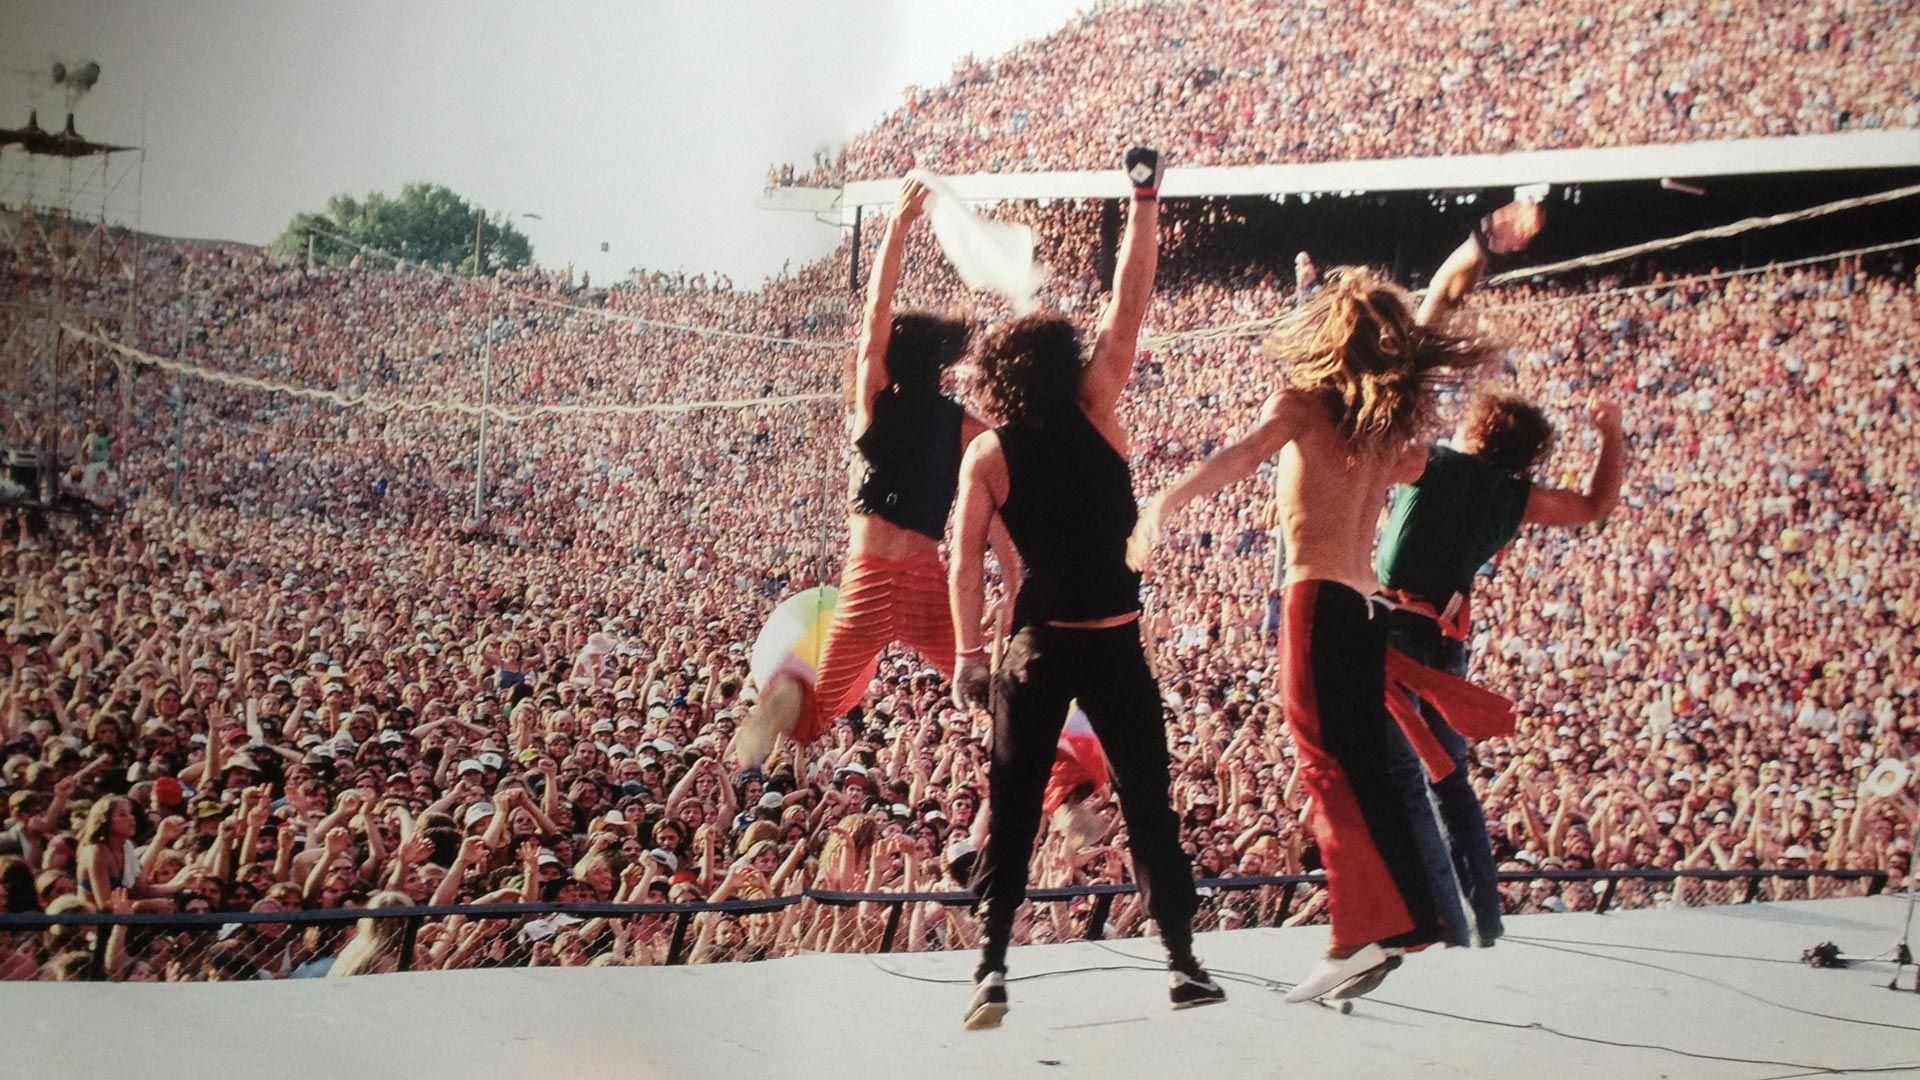 Pin By Marc Micchelli On Texxas Jam Van Halen Eddie Van Halen Heavy Rock